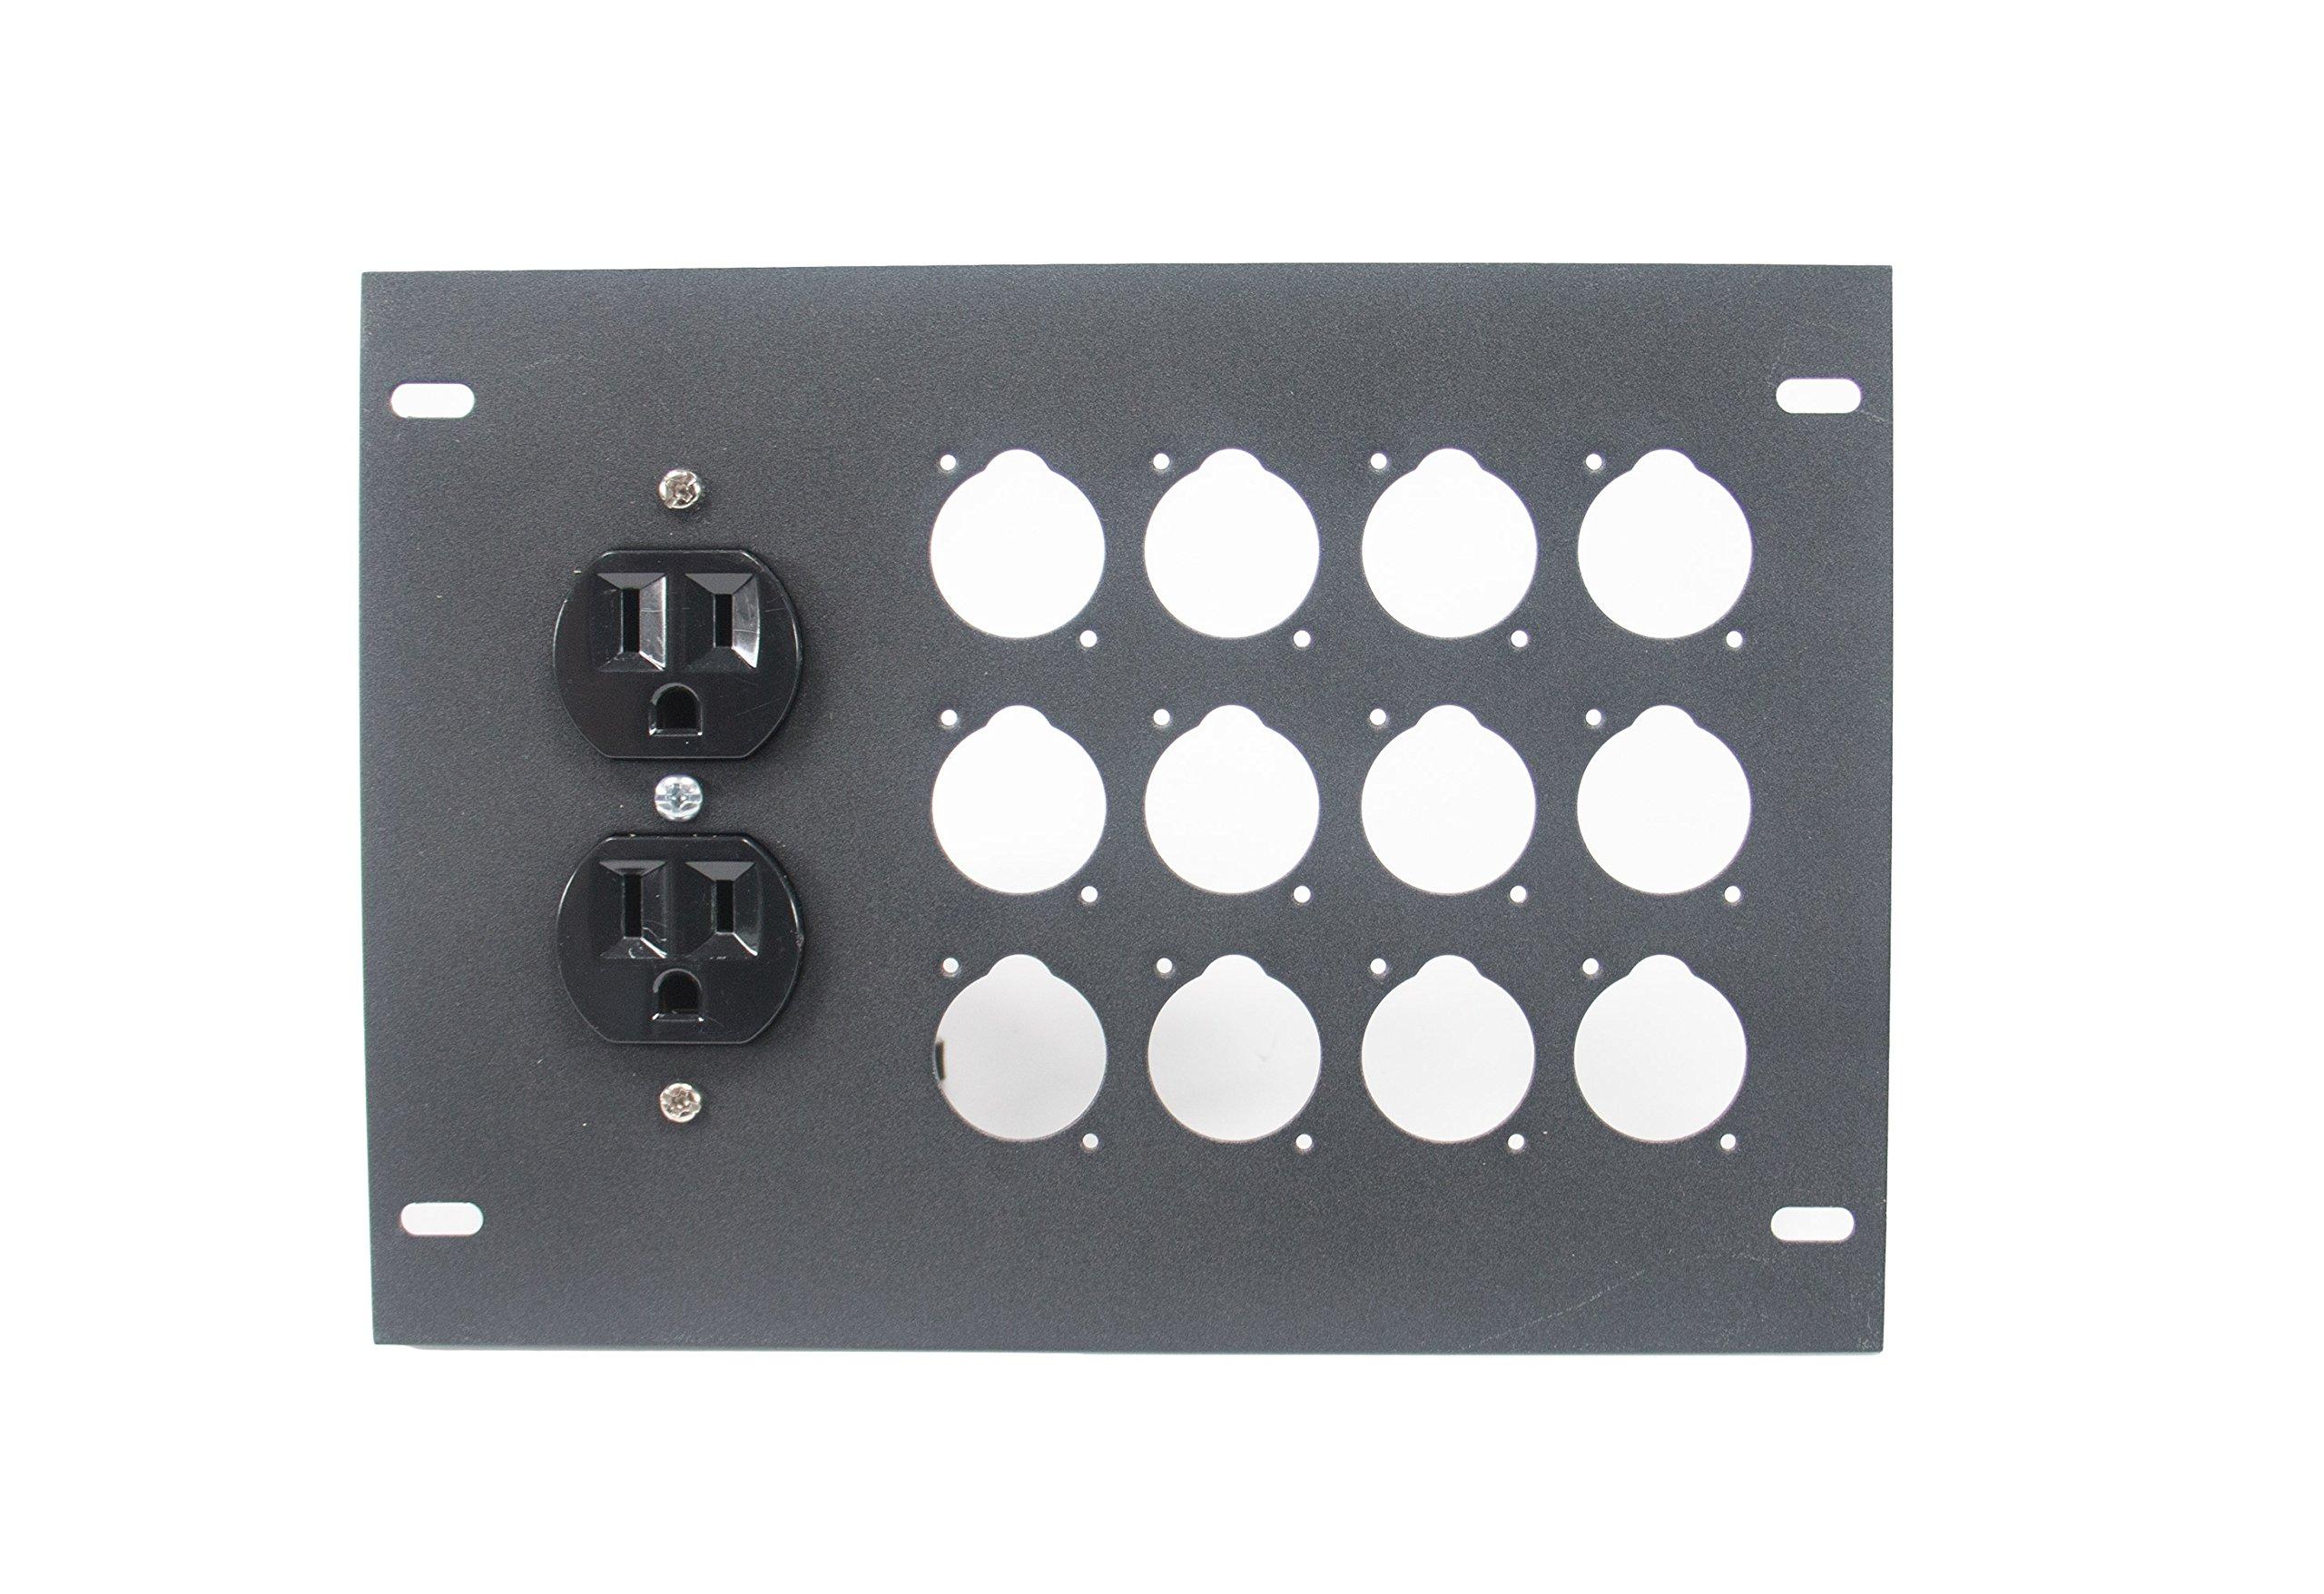 Elite Core FBL-PLATE-12+AC Plate for FBL Floor Box With AC Duplex - no connectors by Elite Core (Image #2)